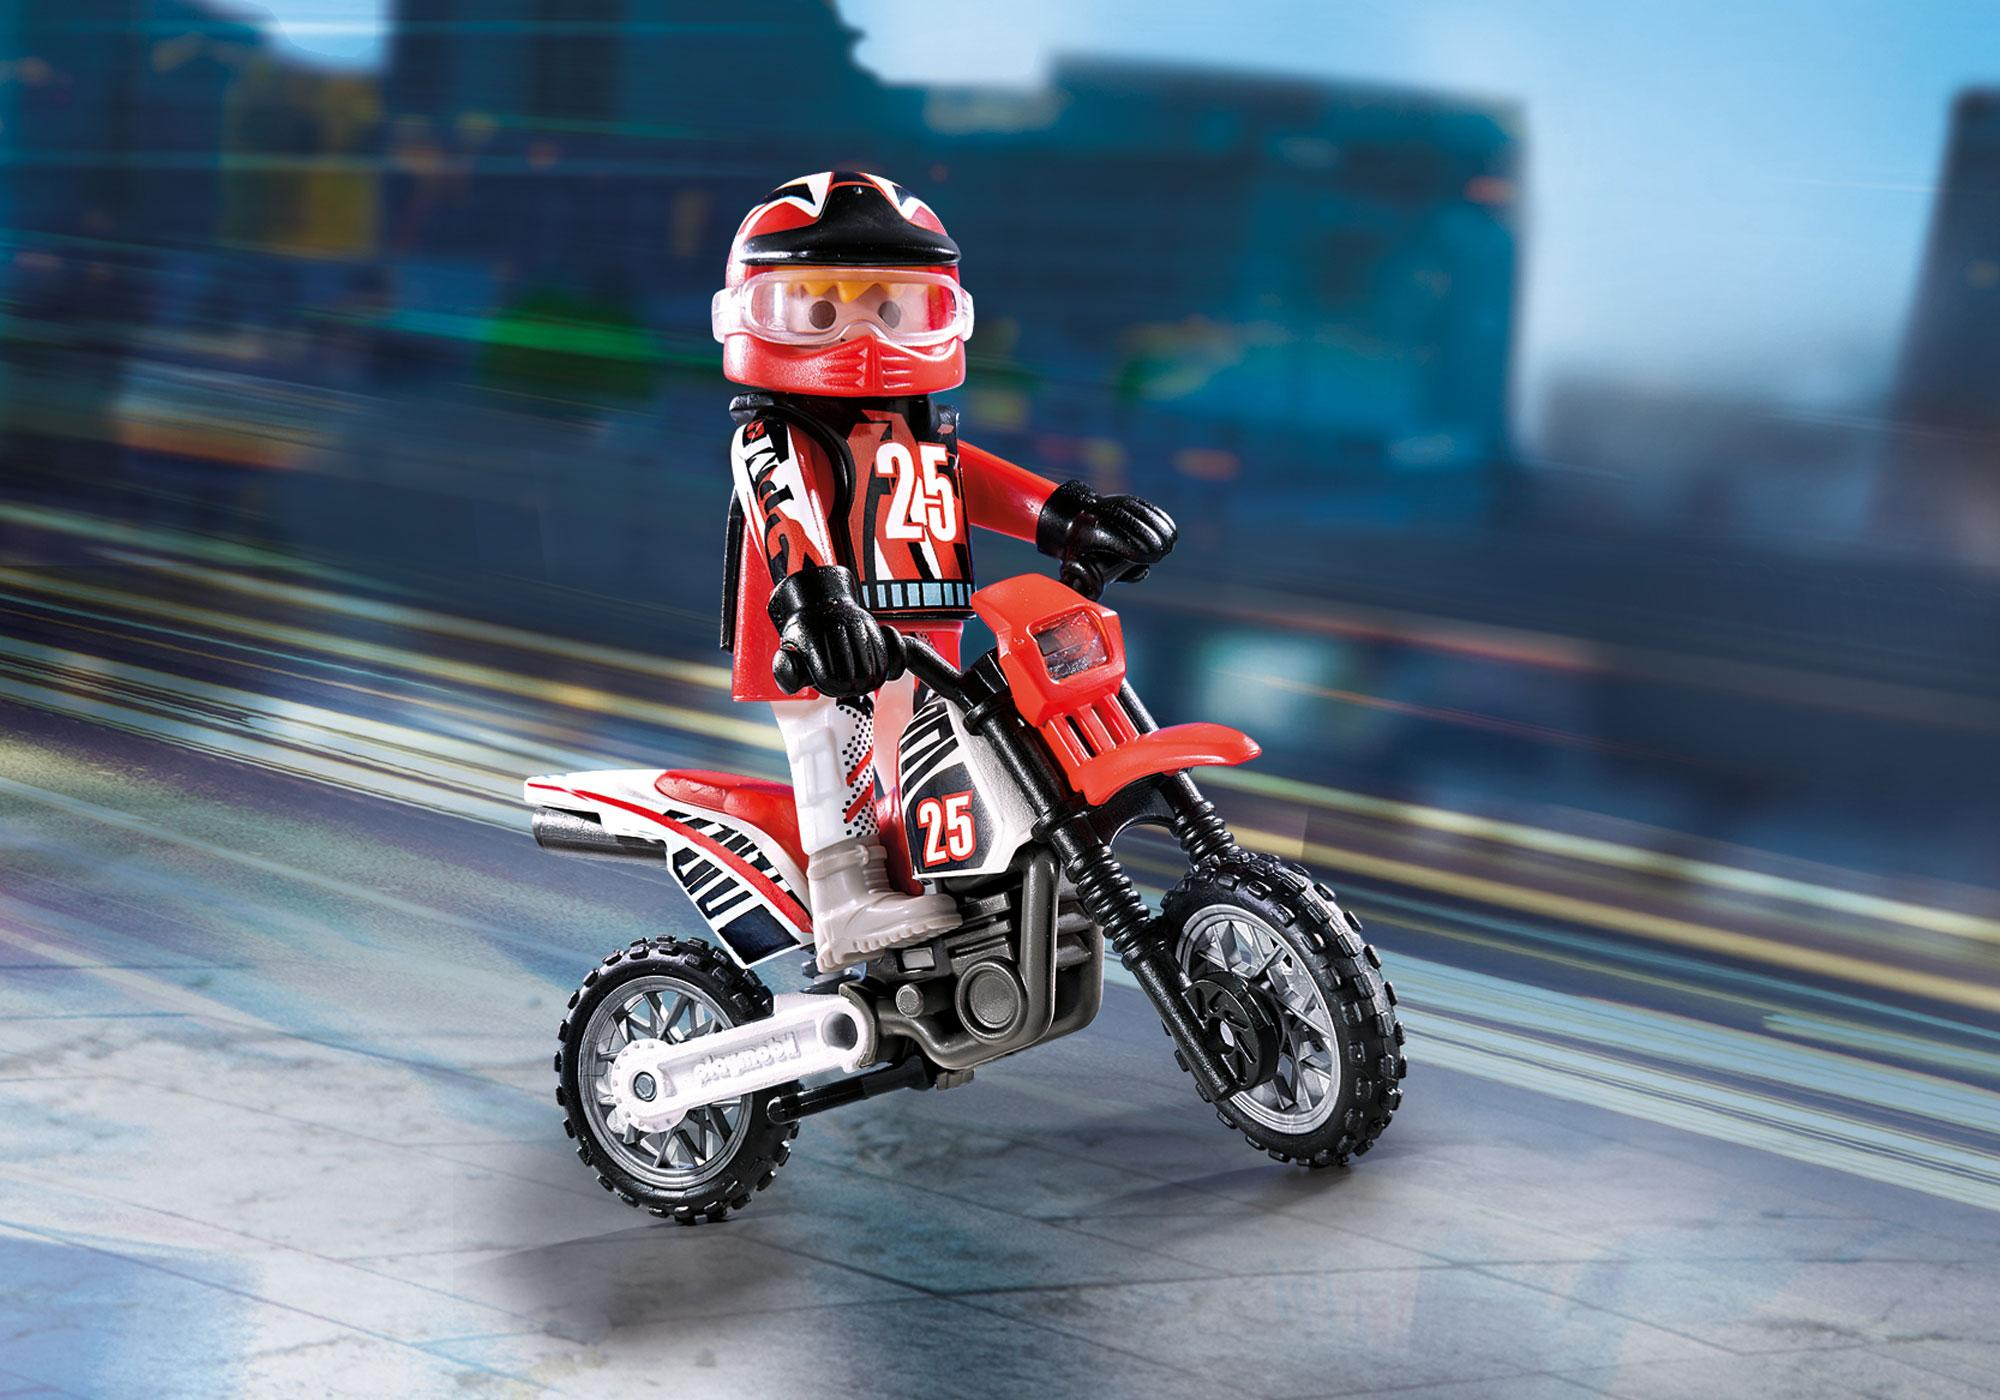 9357_product_detail/Οδηγός μηχανής motocross